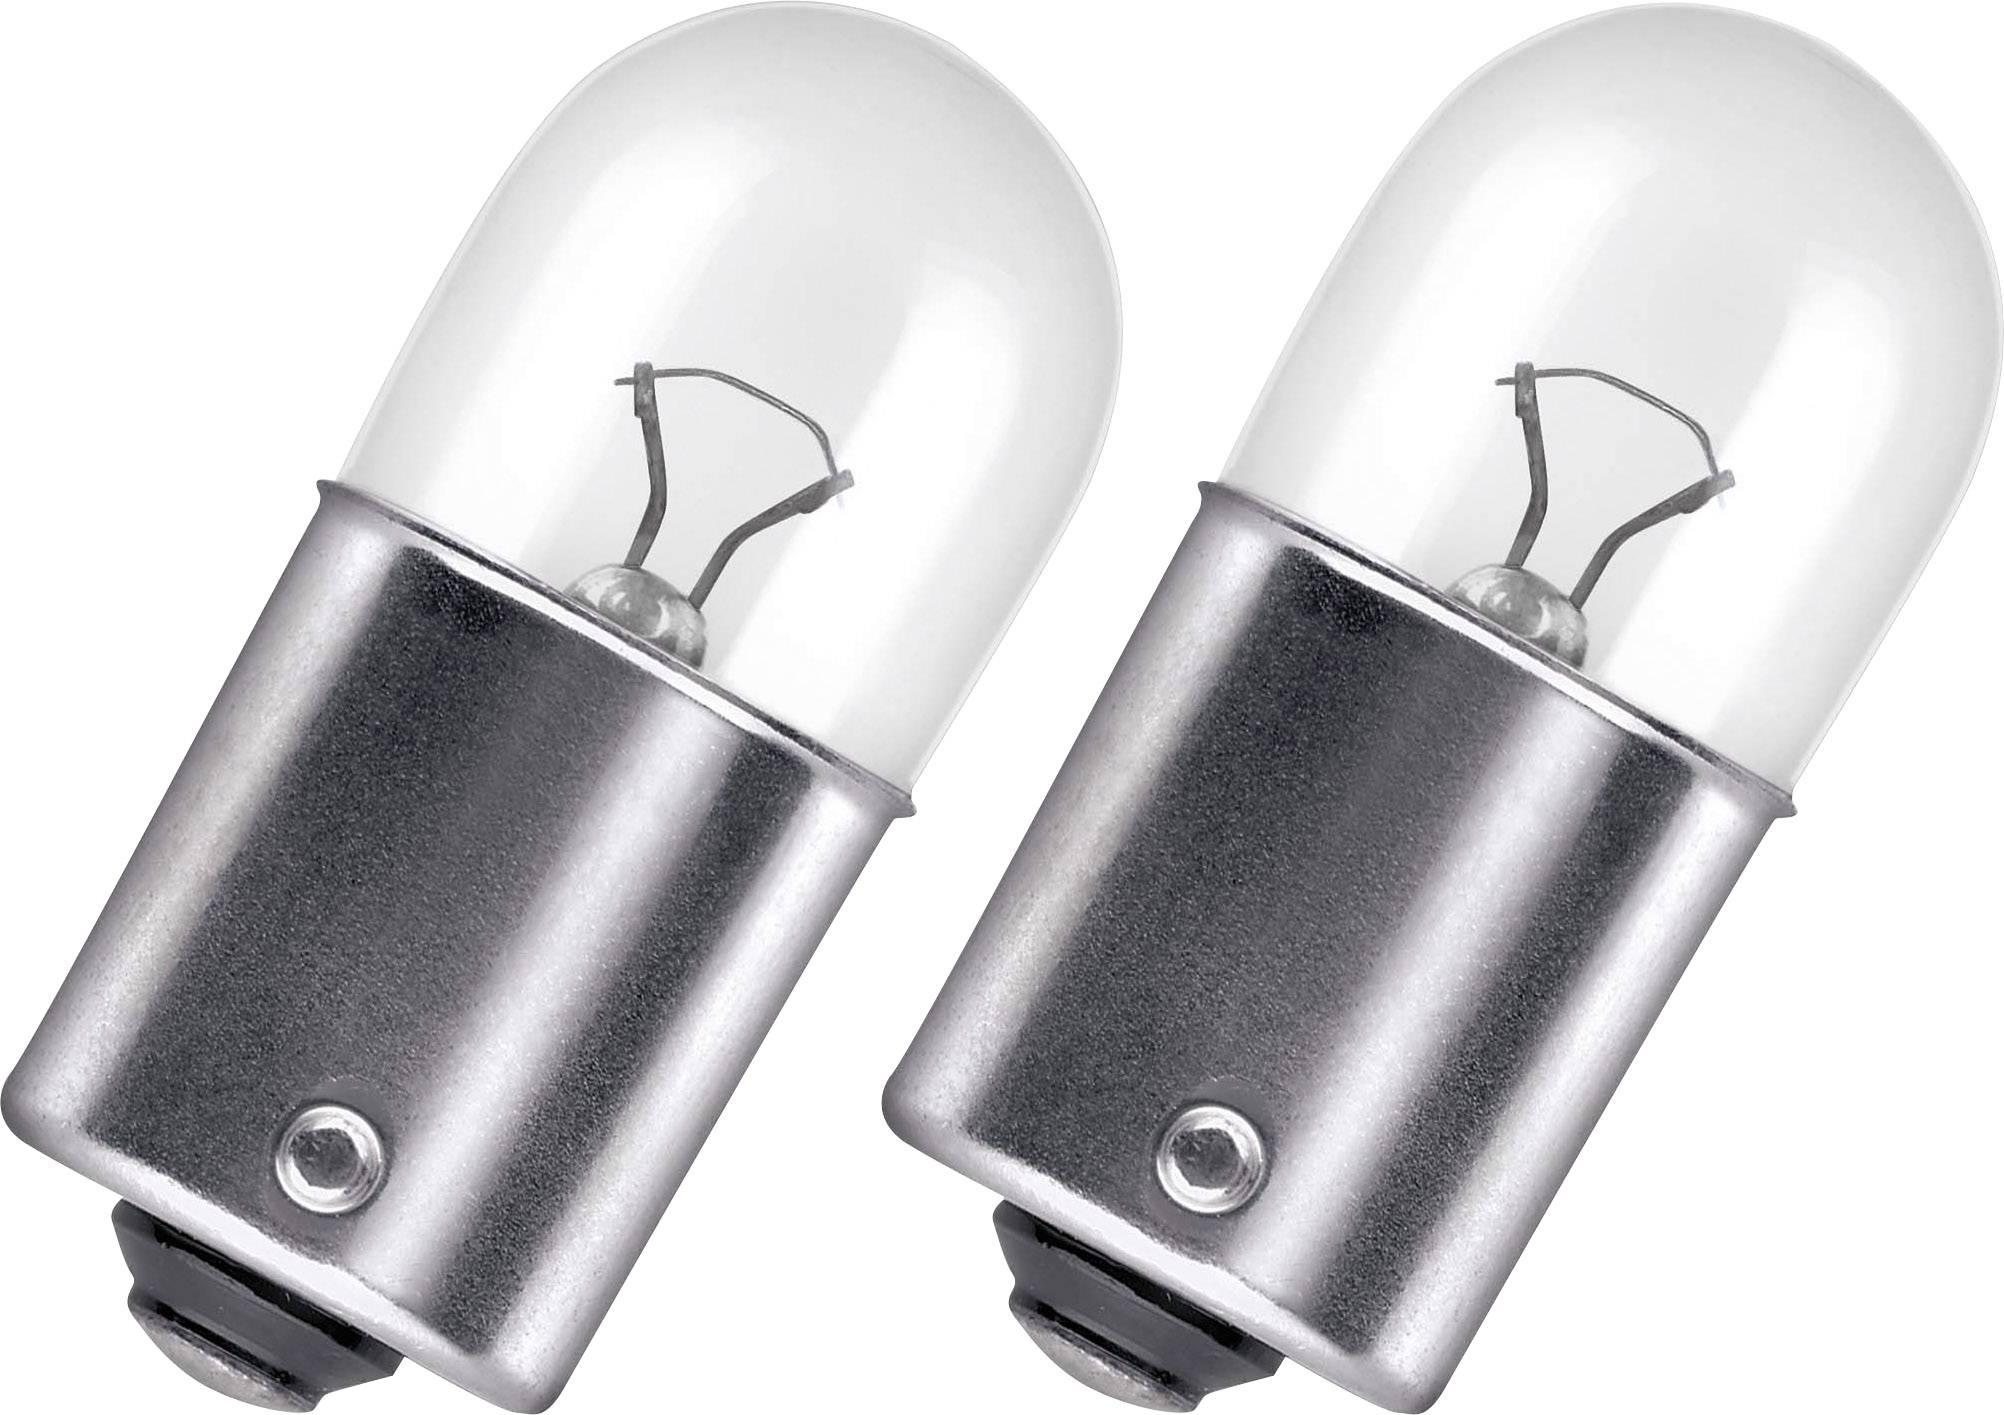 Signálne svetlo Osram Auto KOGELLAMP R5 W 5007-02B, R5W, 5 W